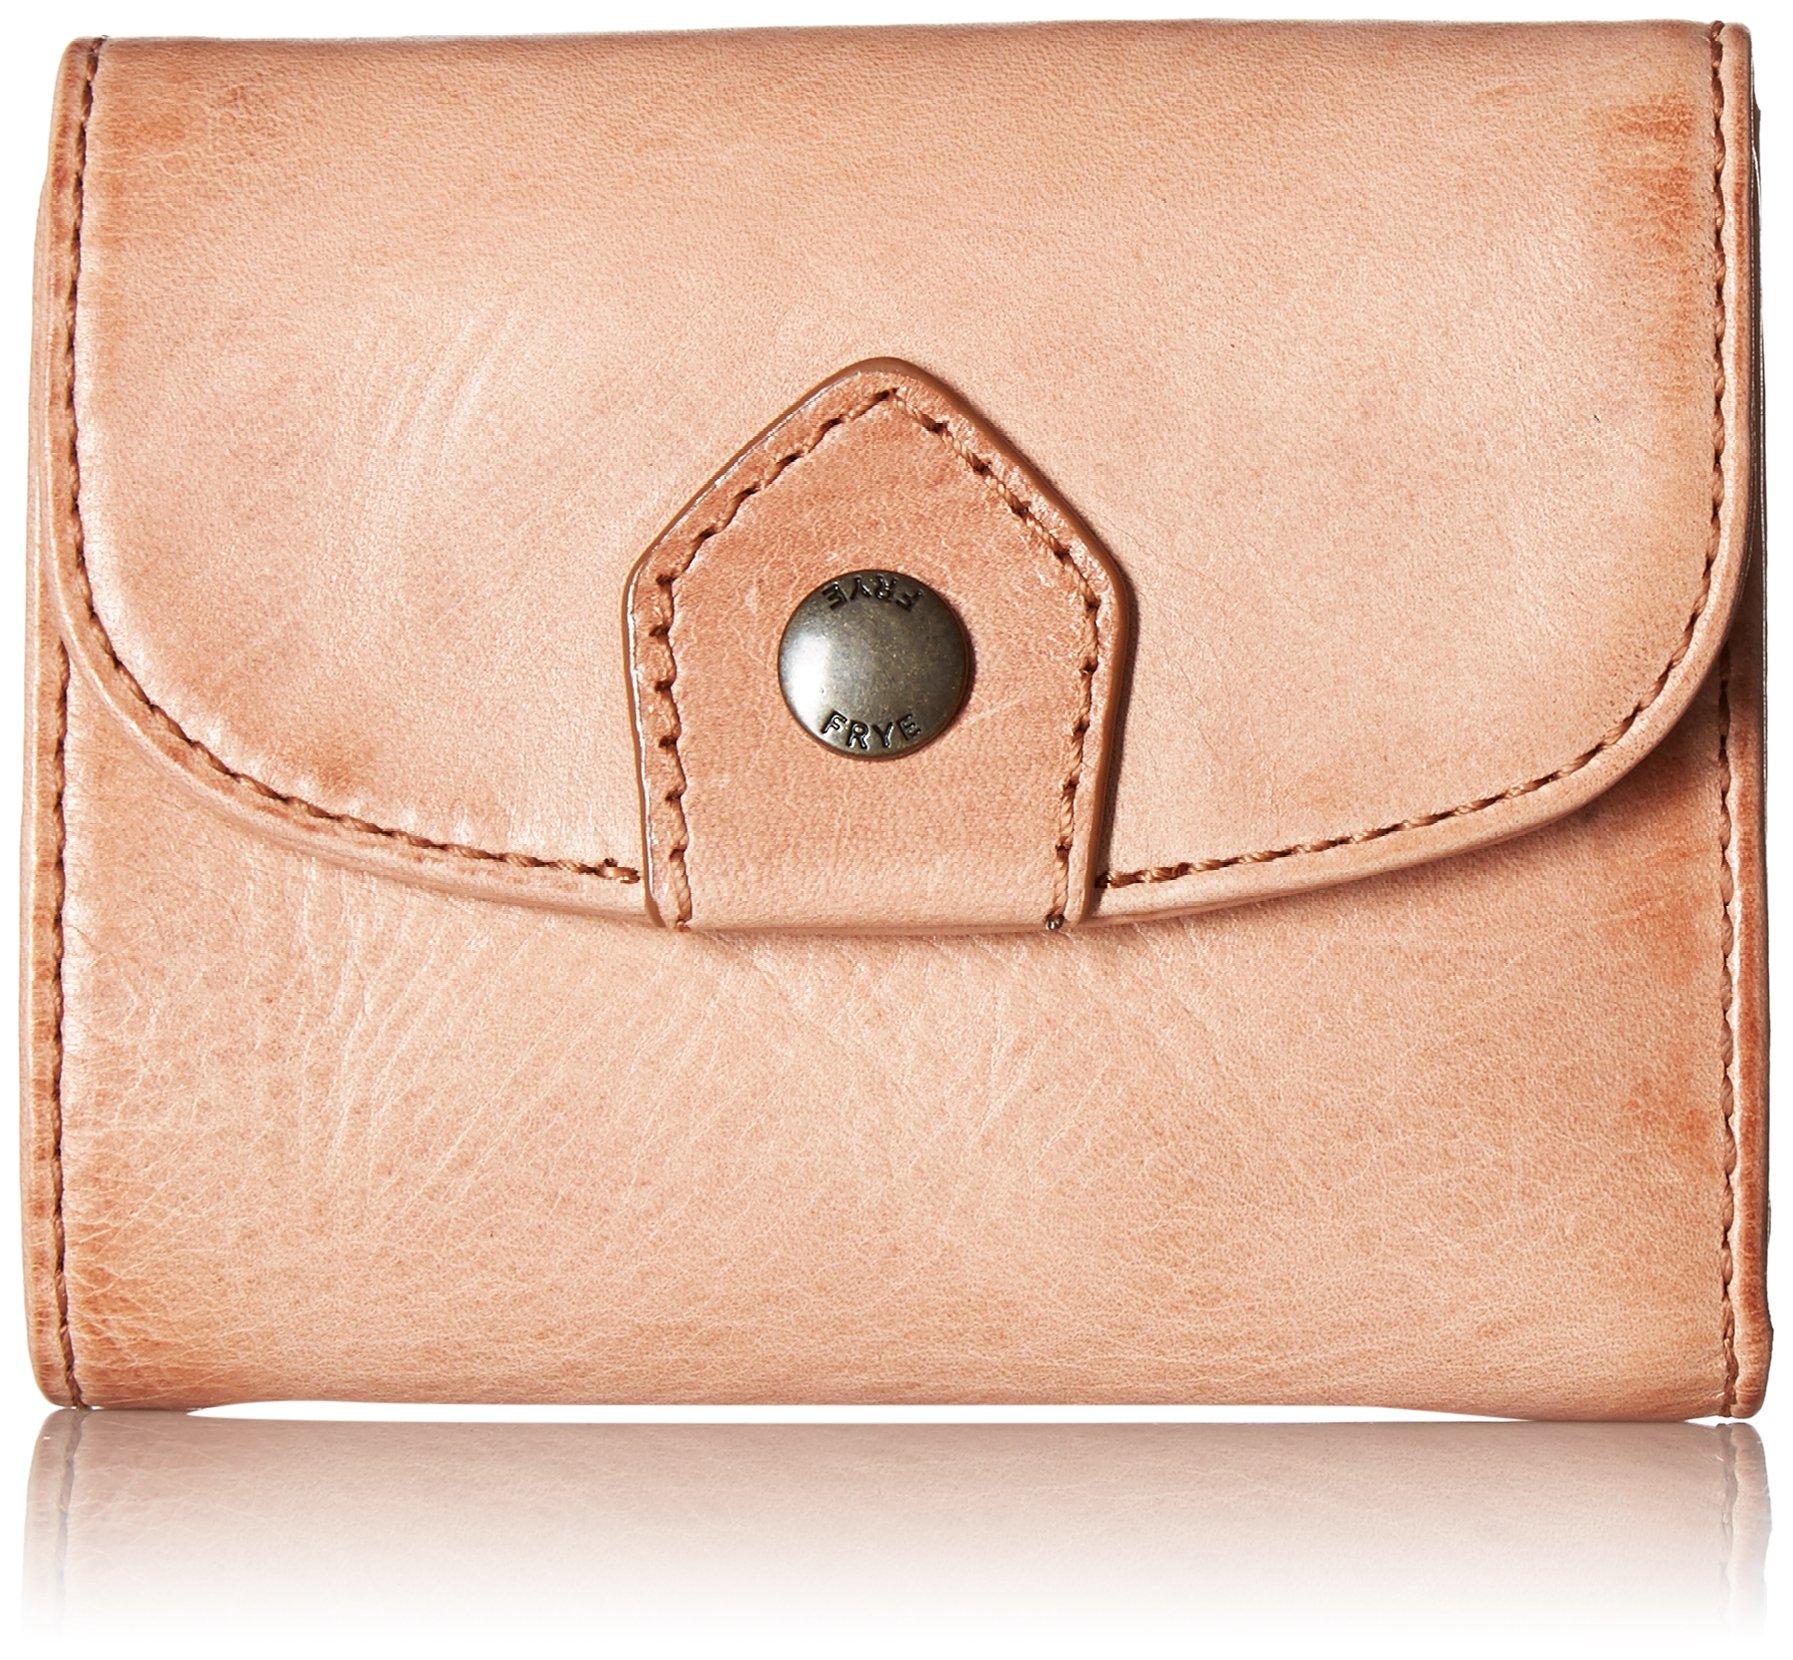 Melissa Medium Snap Wallet Wallet, Dusty Rose, One Size by FRYE